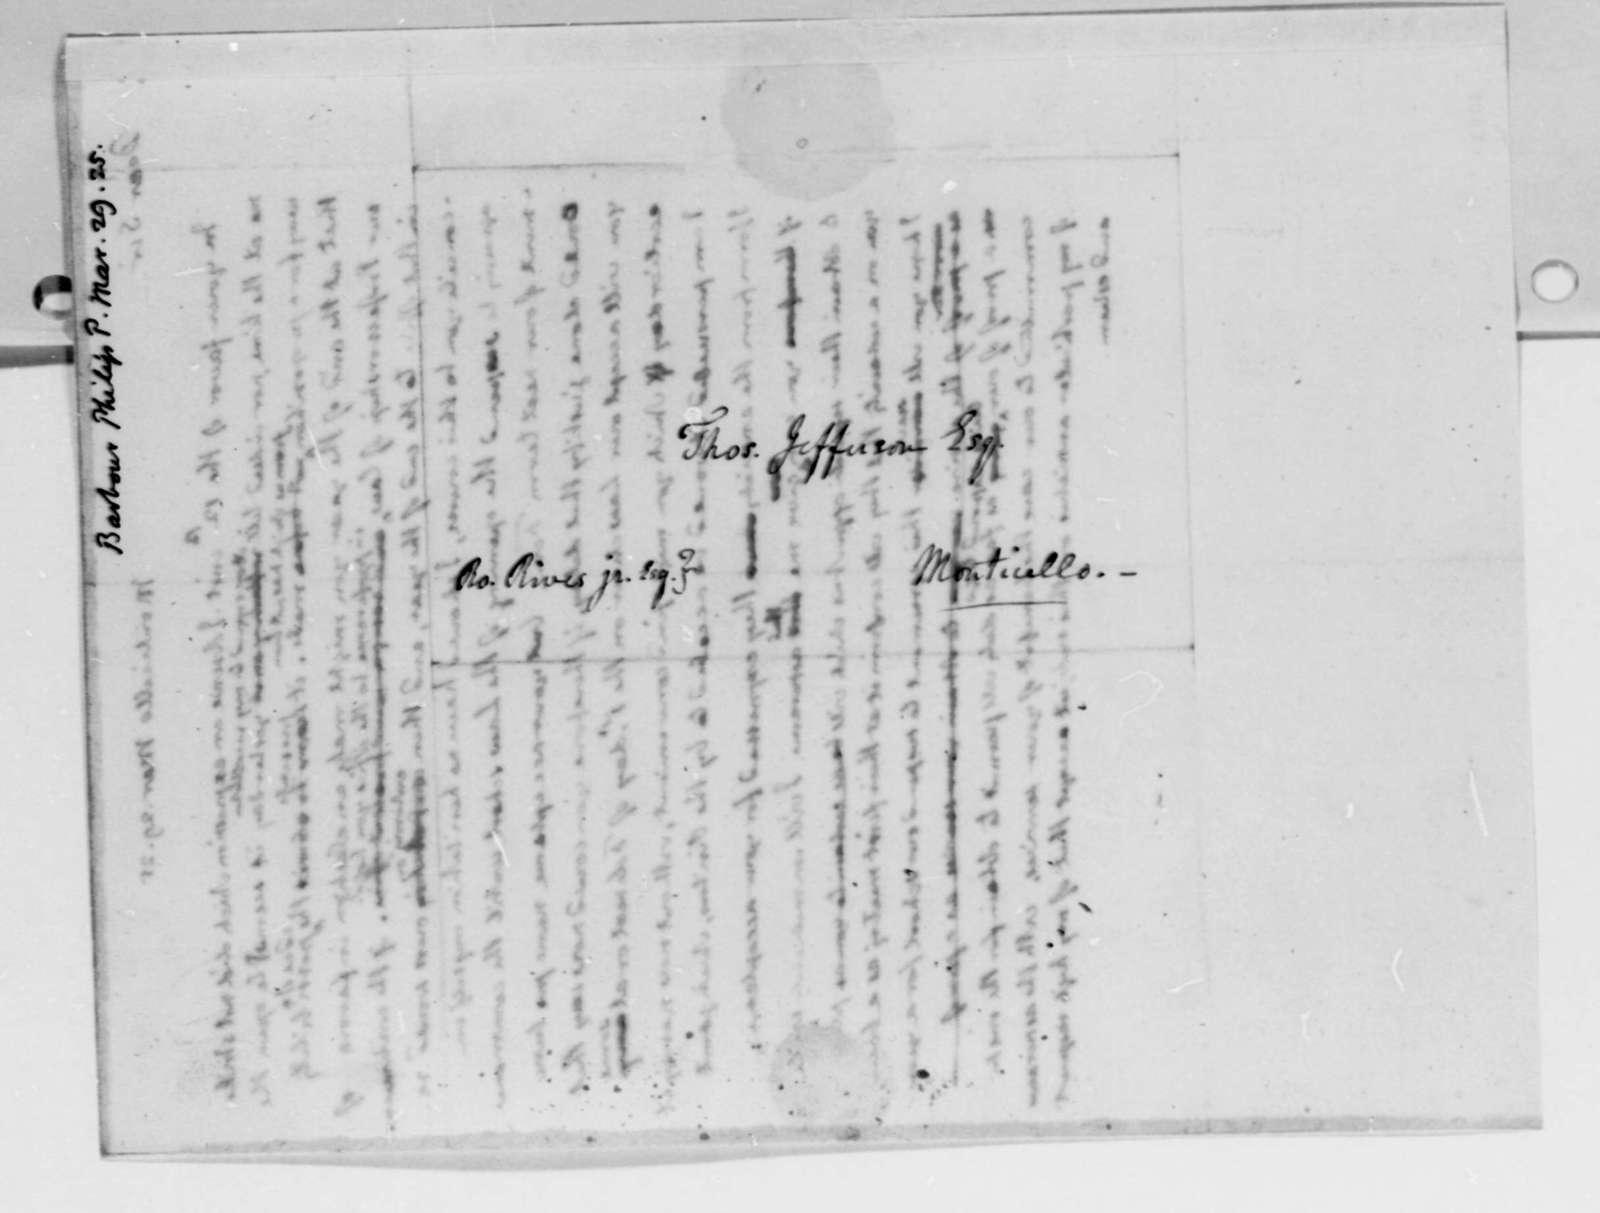 Thomas Jefferson to Philip P. Barbour, March 29, 1825